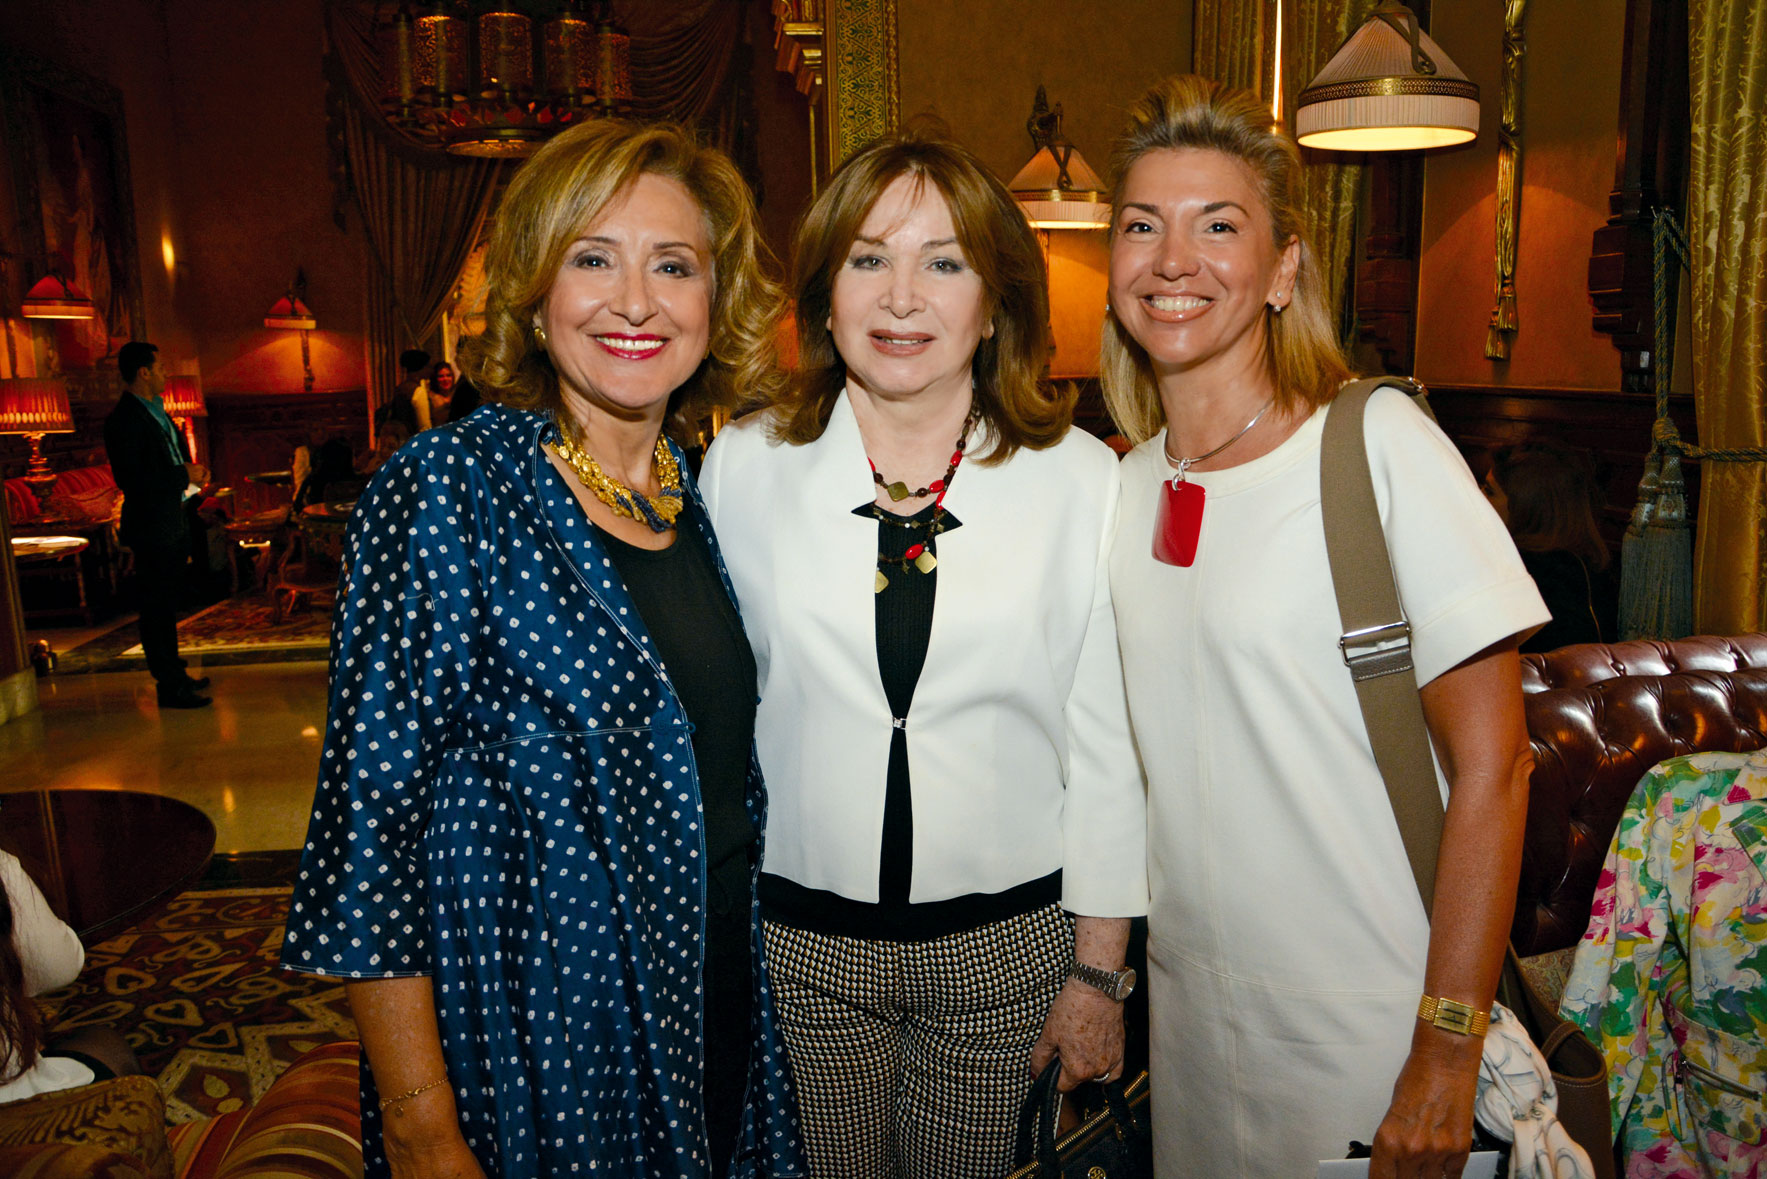 Ms. Samia Shihata, Ms. Nadia El Arabi & Ms. Rania Teymour